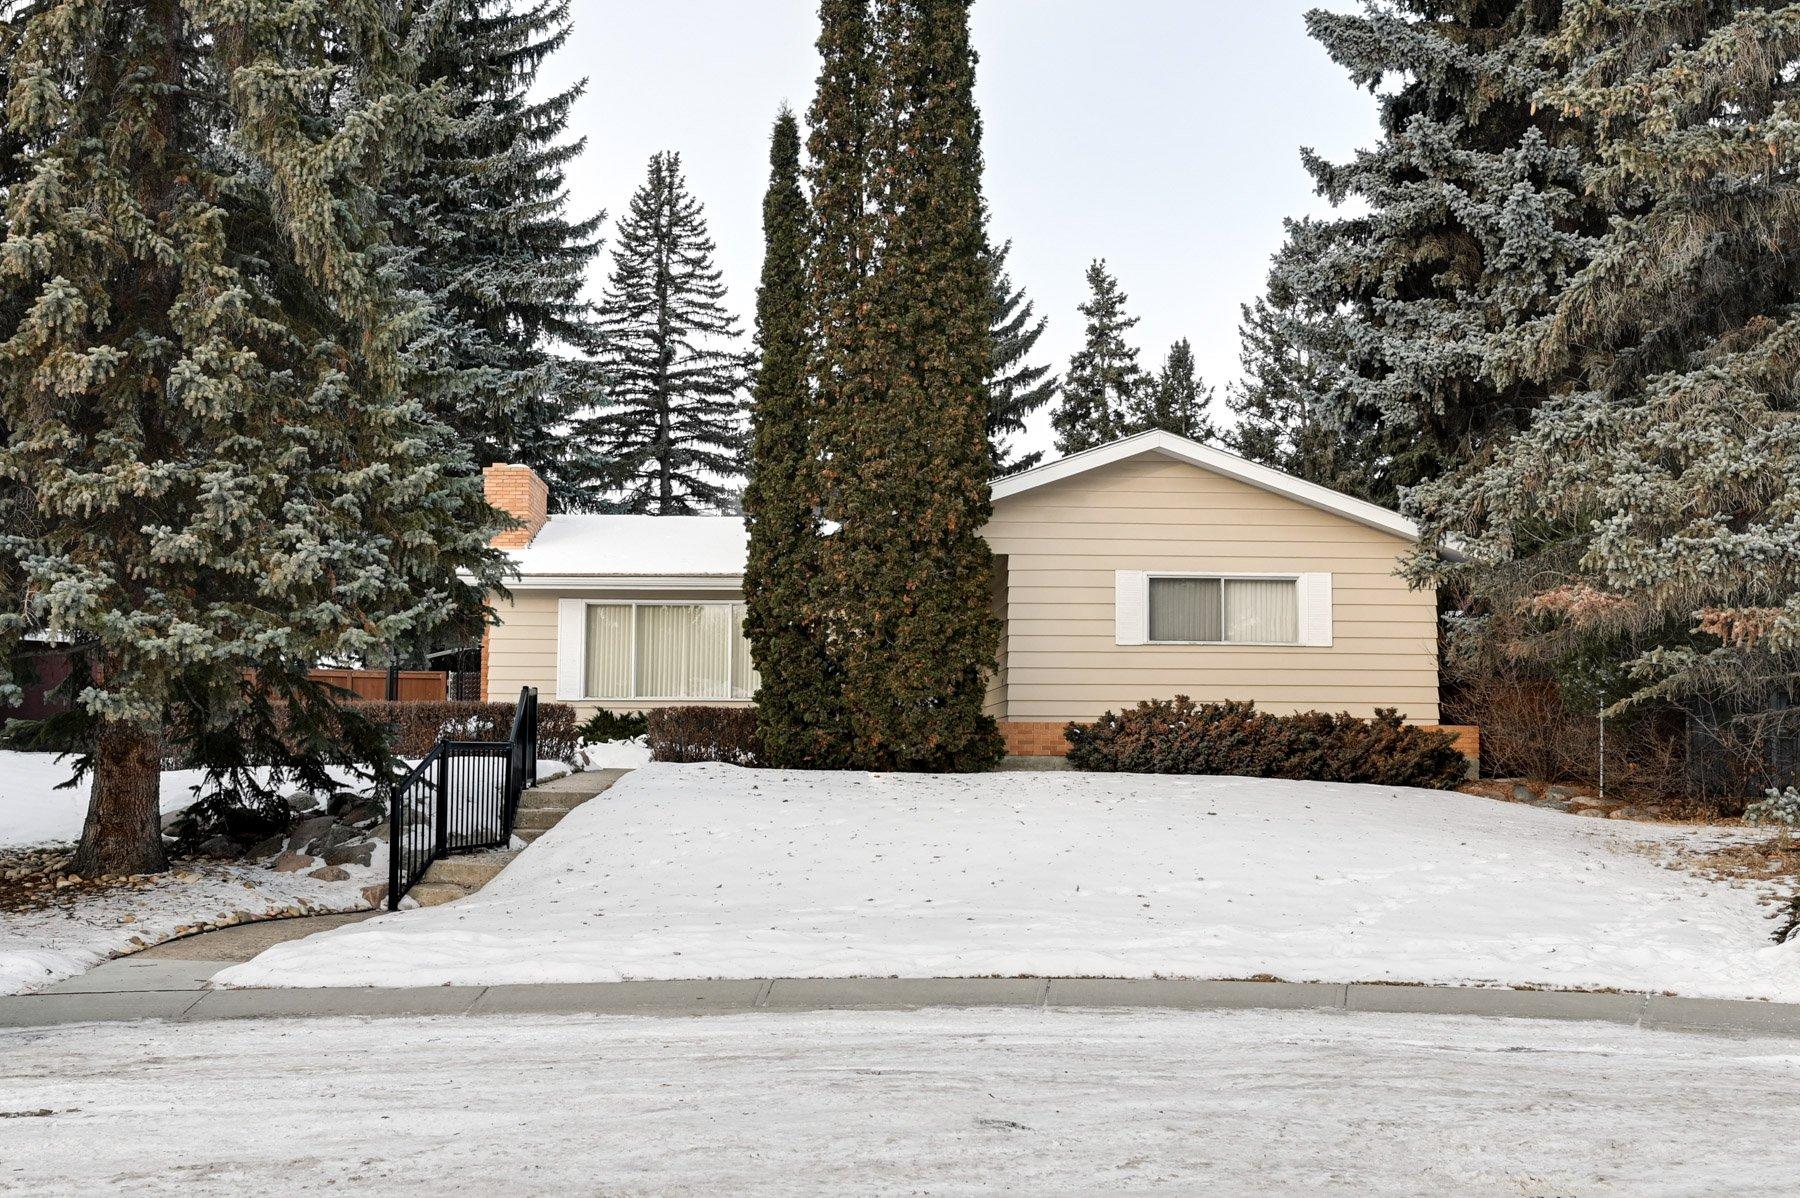 Main Photo: 8526 141 Street in Edmonton: Zone 10 House for sale